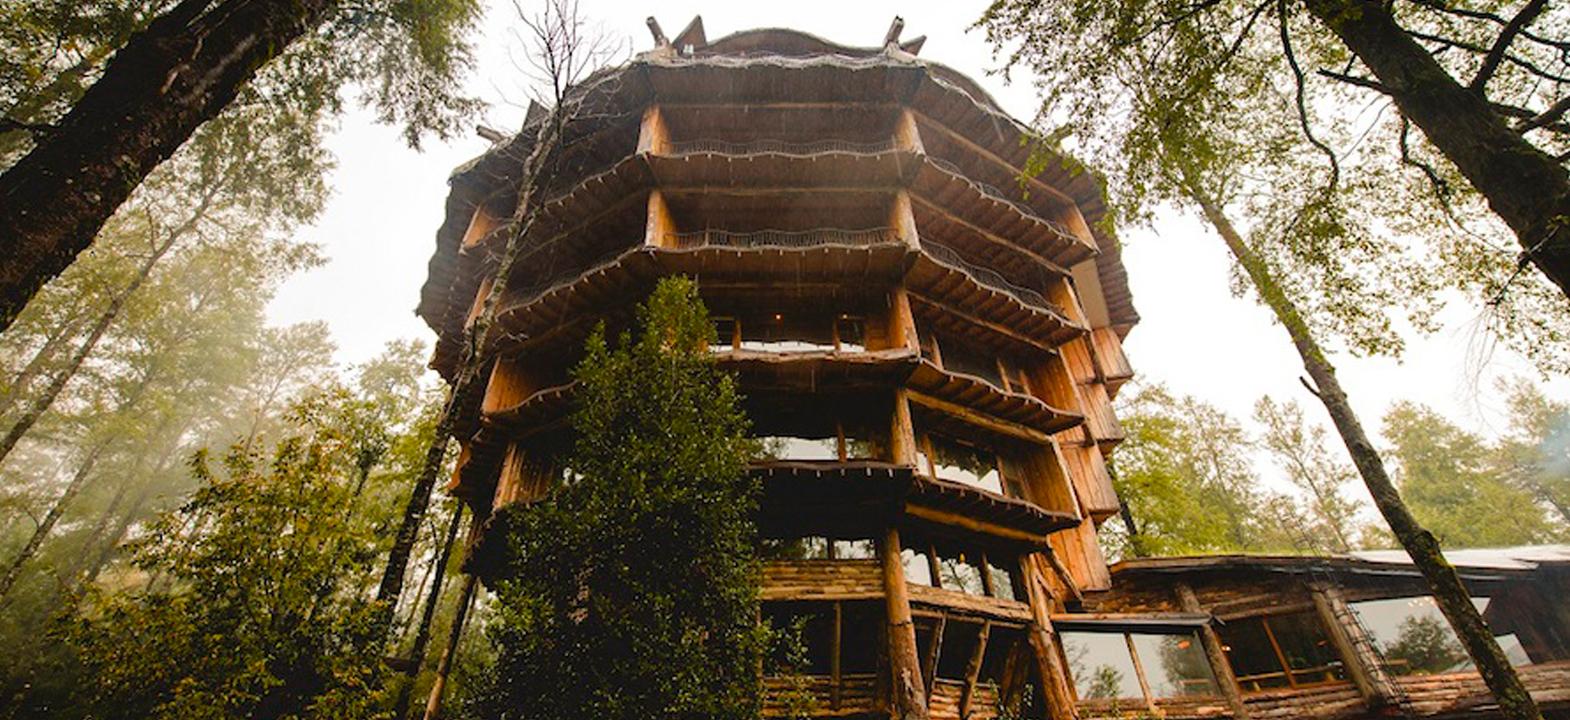 De 8 mooiste treetop hotels ter wereld enfait - Het mooiste huis ter wereld ...